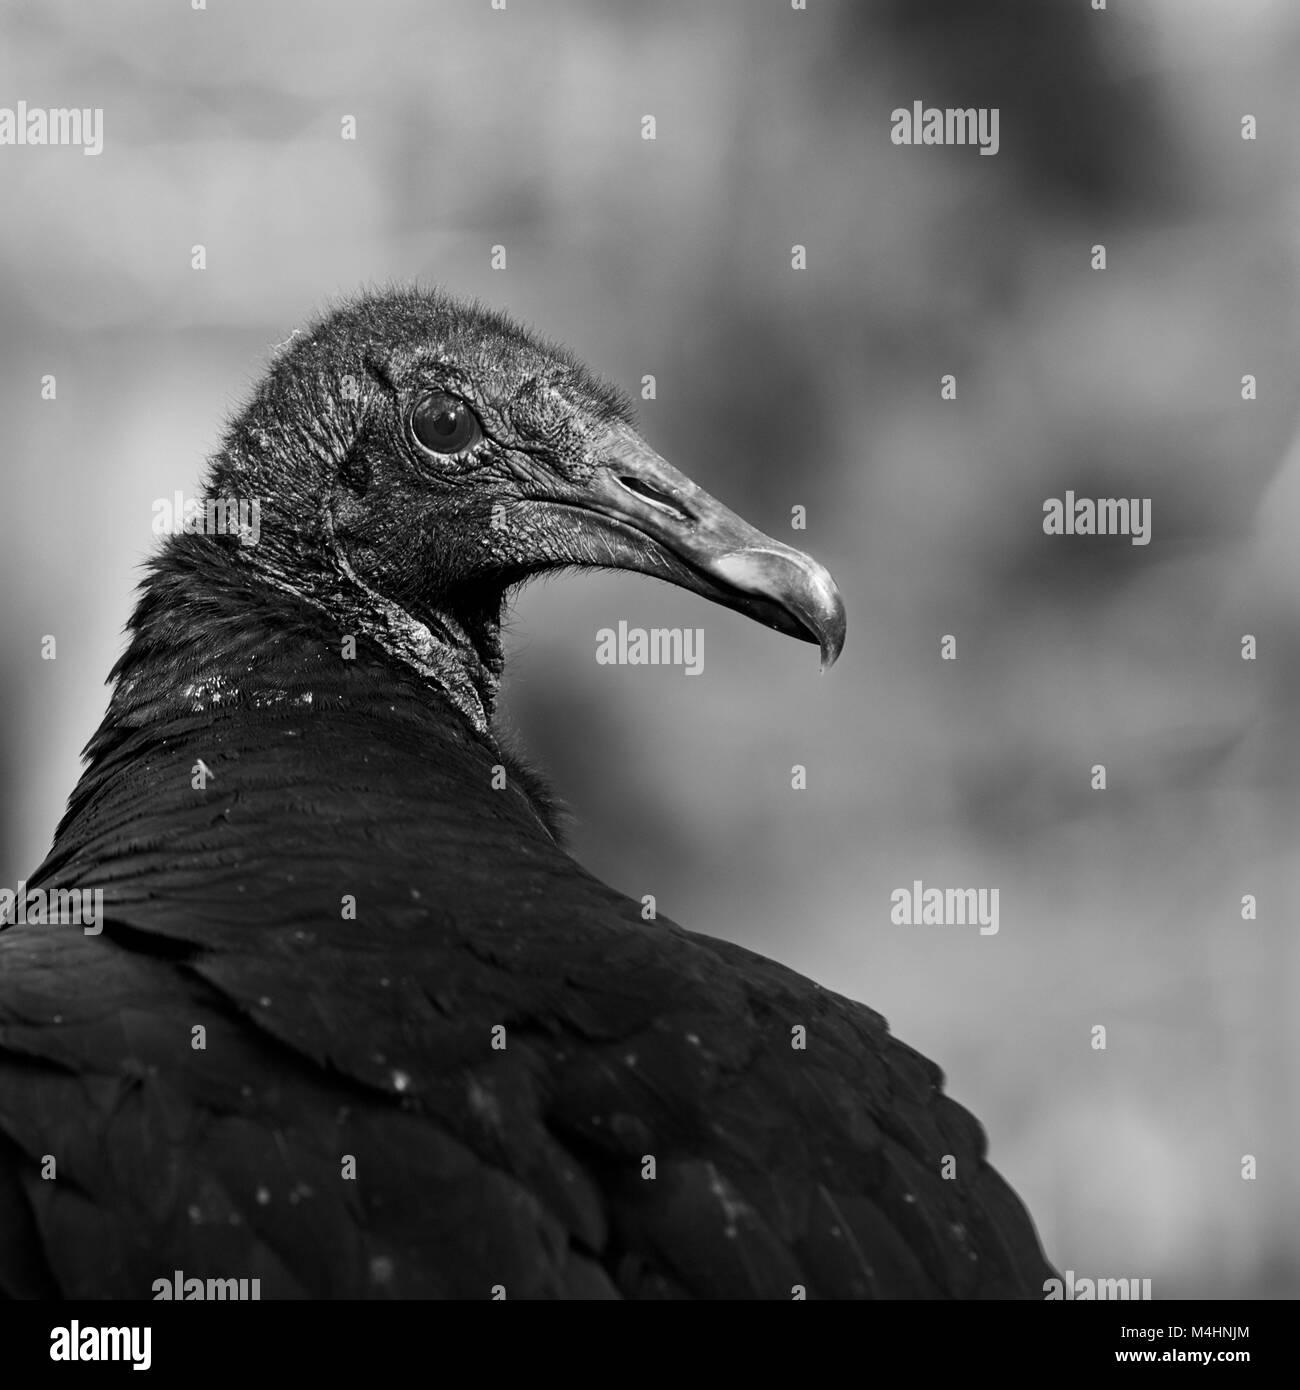 Turkey vulture close up stock image